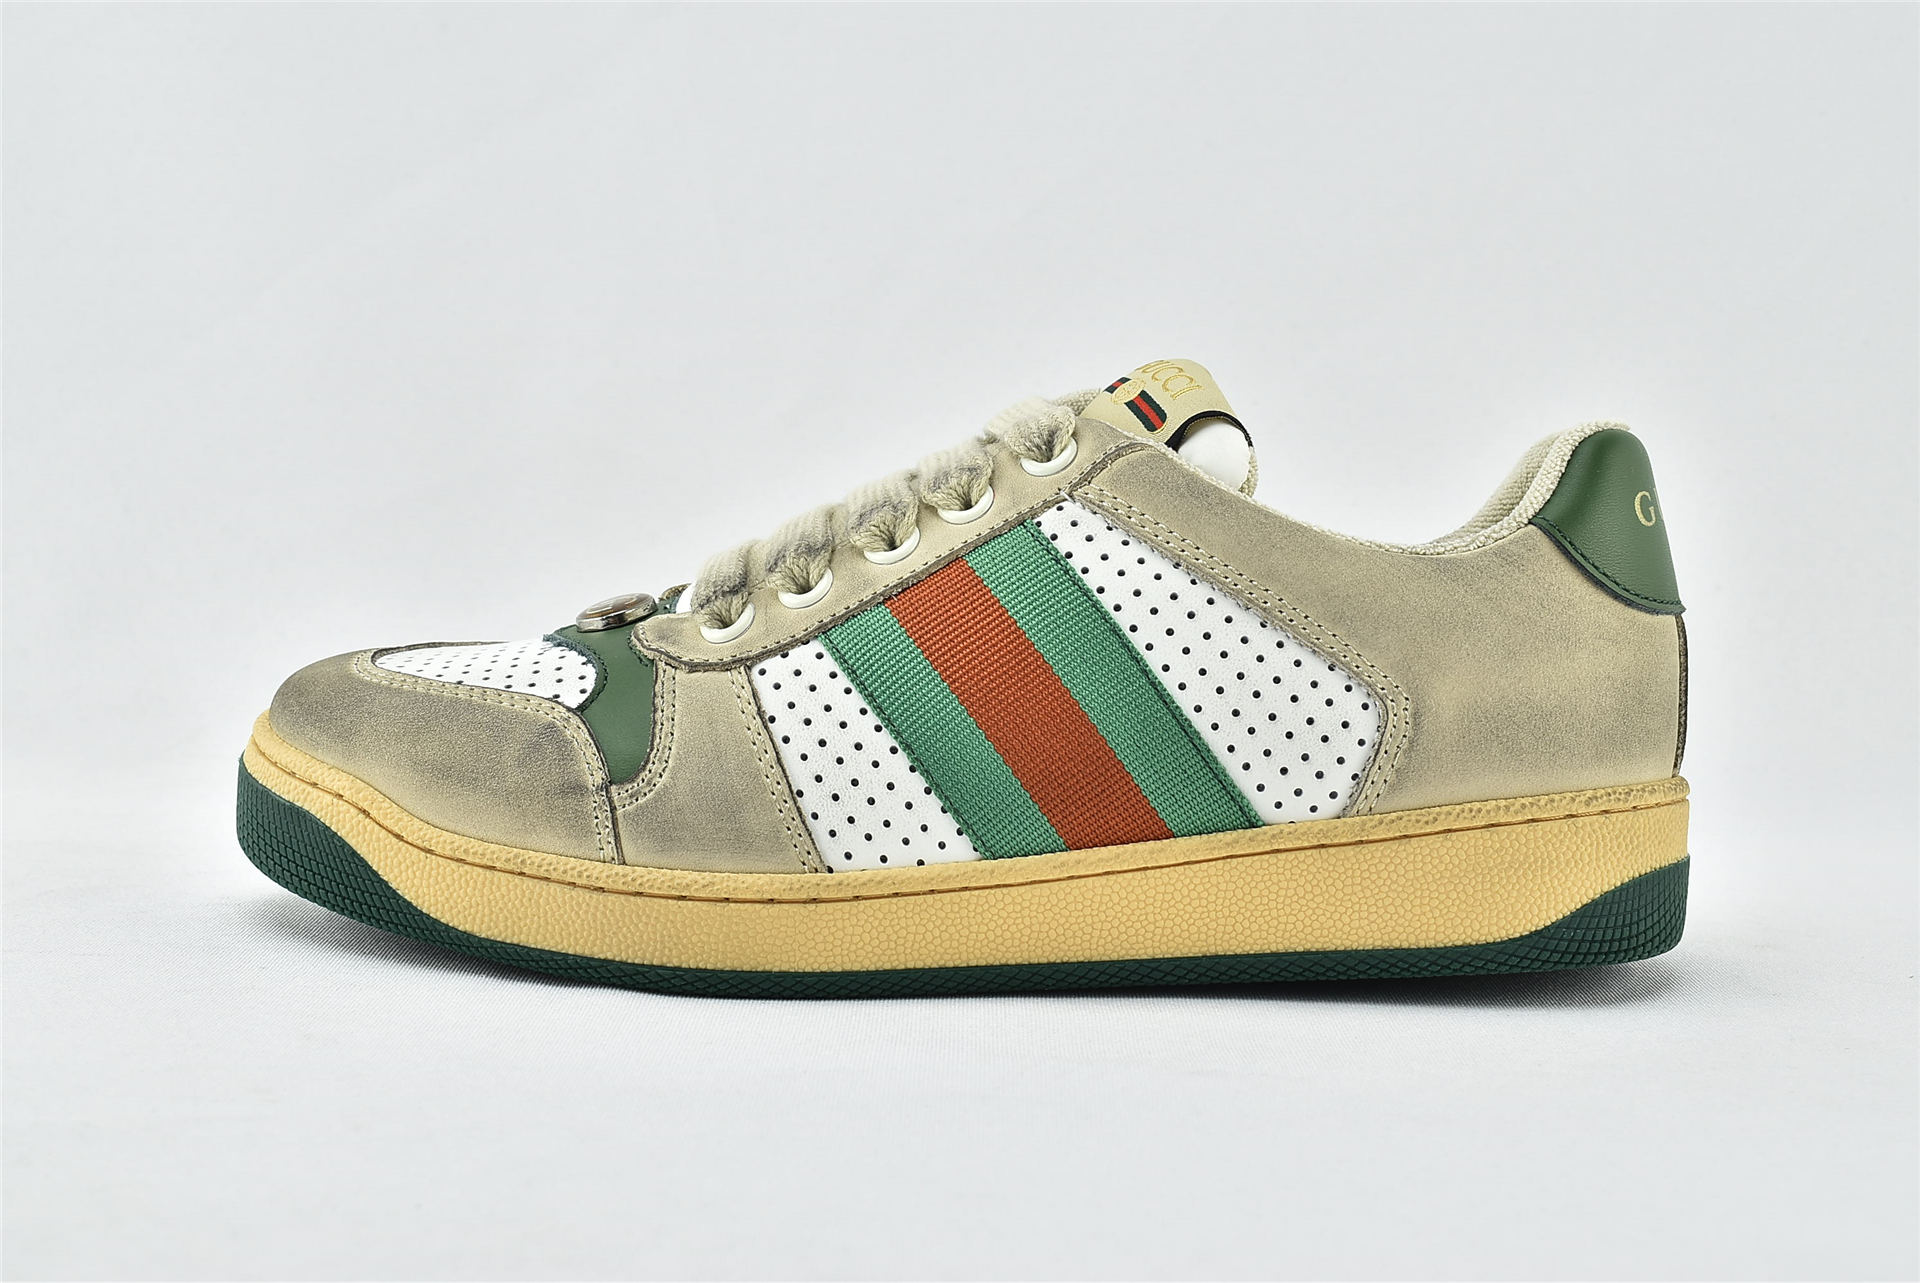 Gucci/古驰 小脏鞋 系列板鞋/灰白 红绿 经典 原版自然做旧 发售 最新包装   芯片 扫码版  男女鞋  情侣款